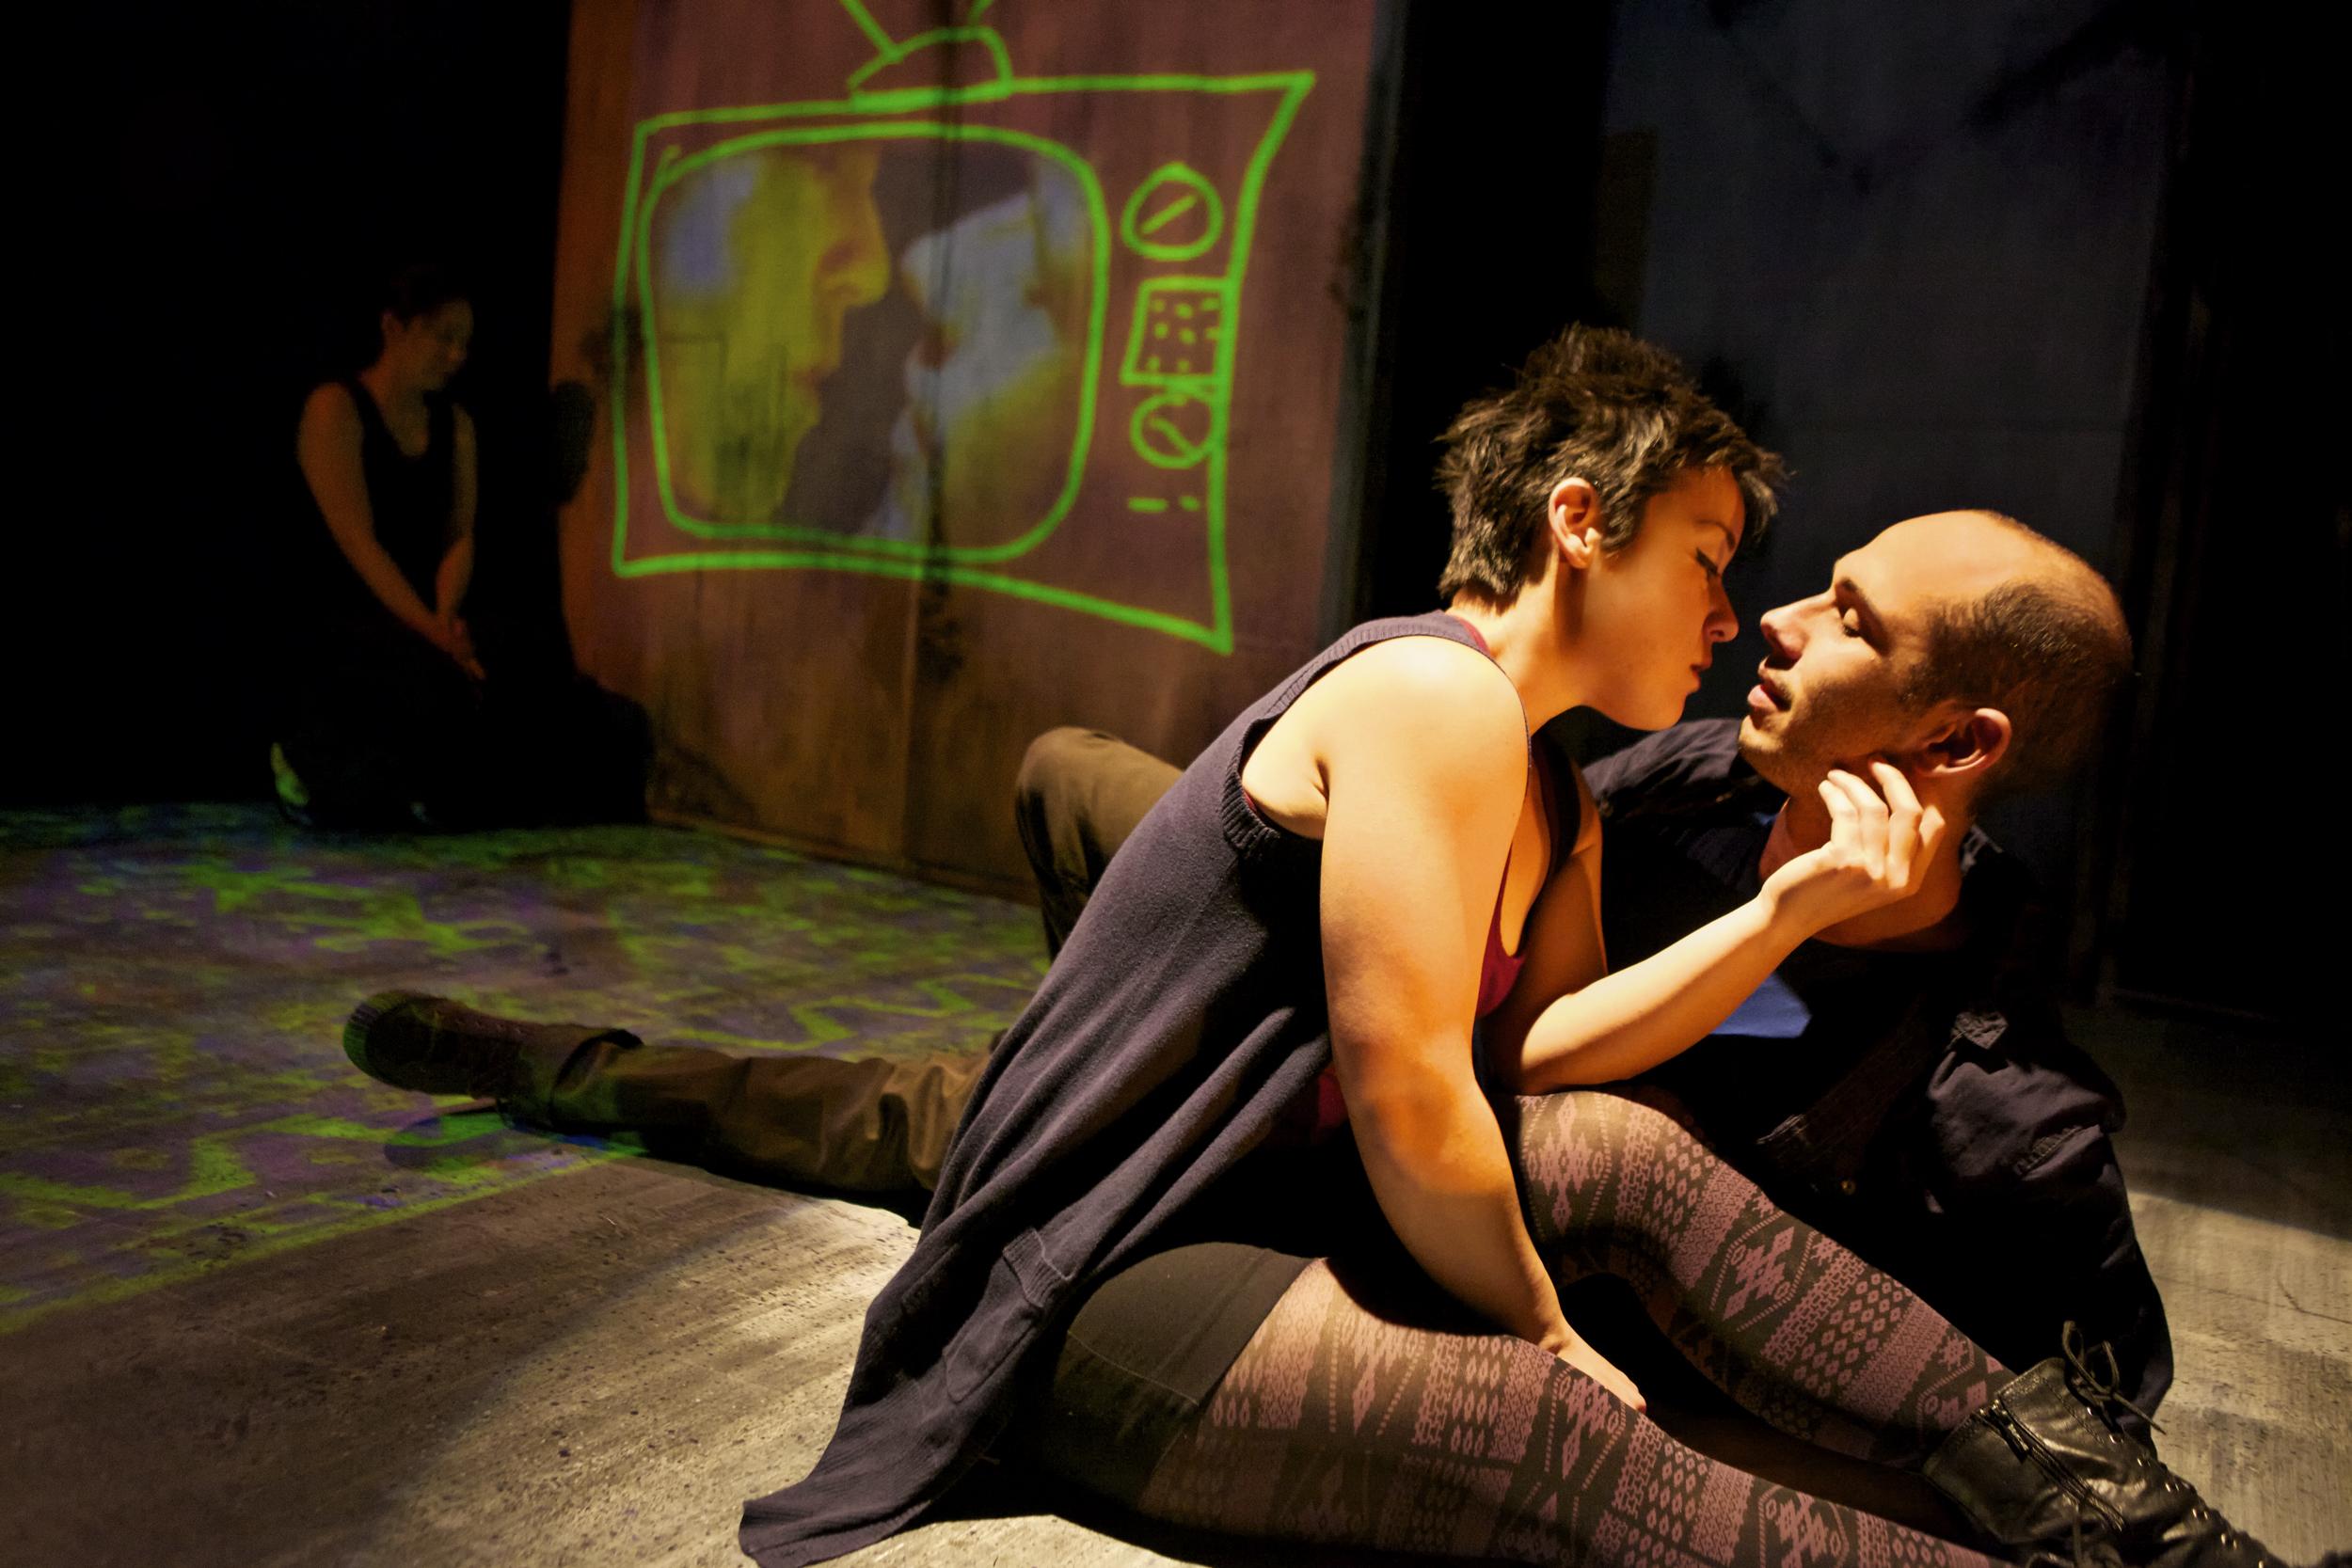 Pictured with: Cindy Im and Ana Ishida, Photo: Pak Han